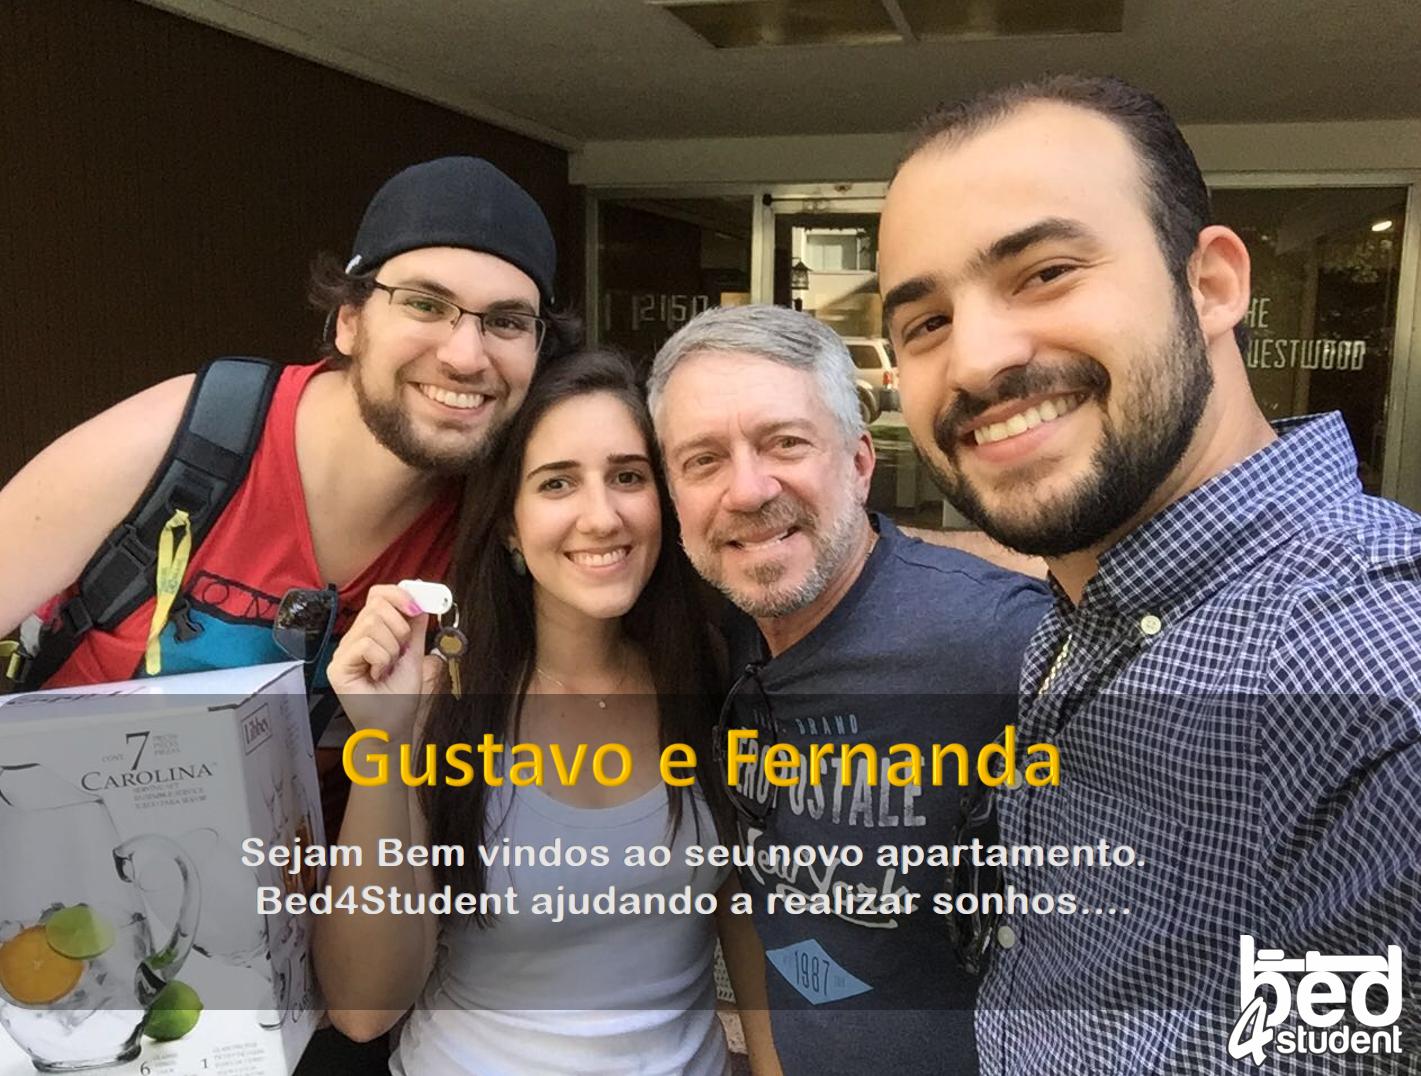 Gustavo e Fernanda